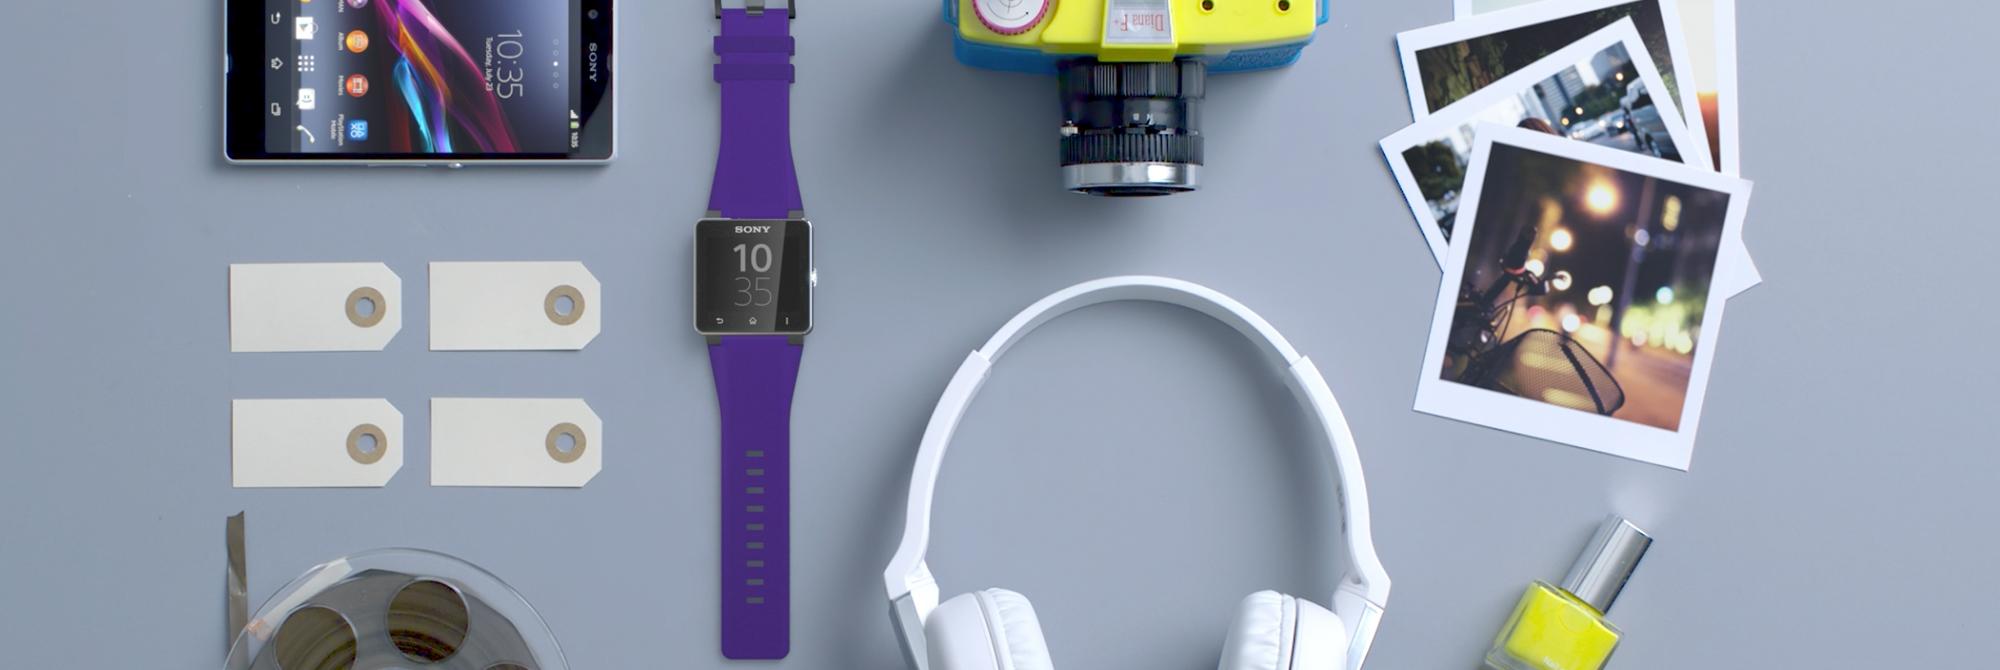 Smartwatch2_Social